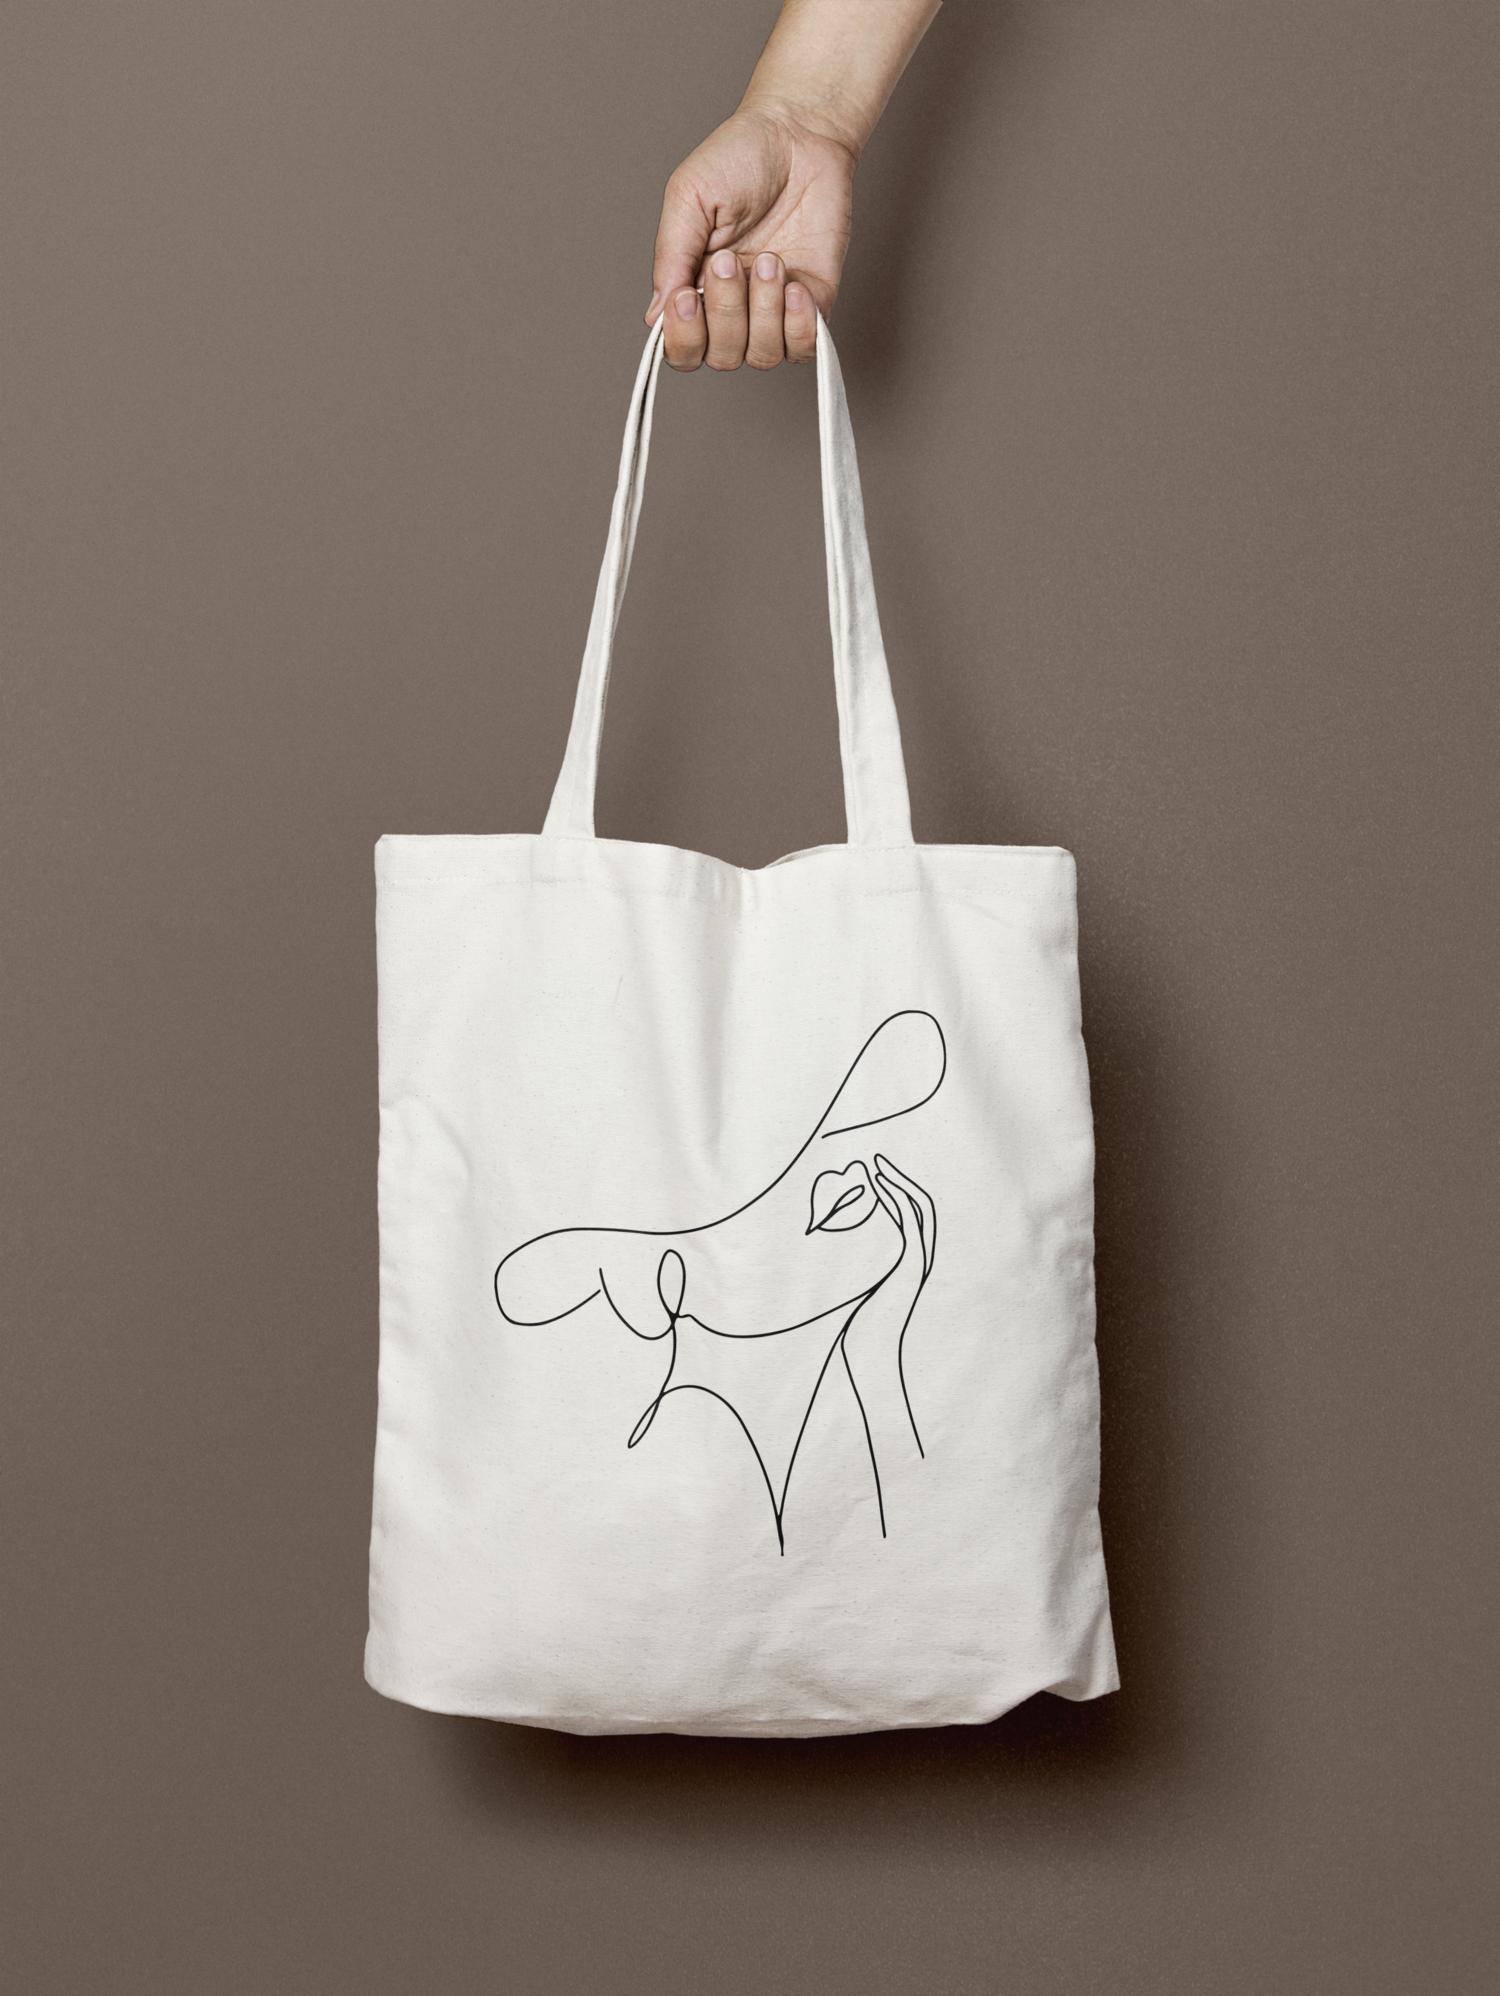 Studio Antheia Tote bag | Branding and design studio #branding #designer  #Antheia #Tote in 2020 | Tote bag canvas design, Canvas bag design, Tote bag  pattern